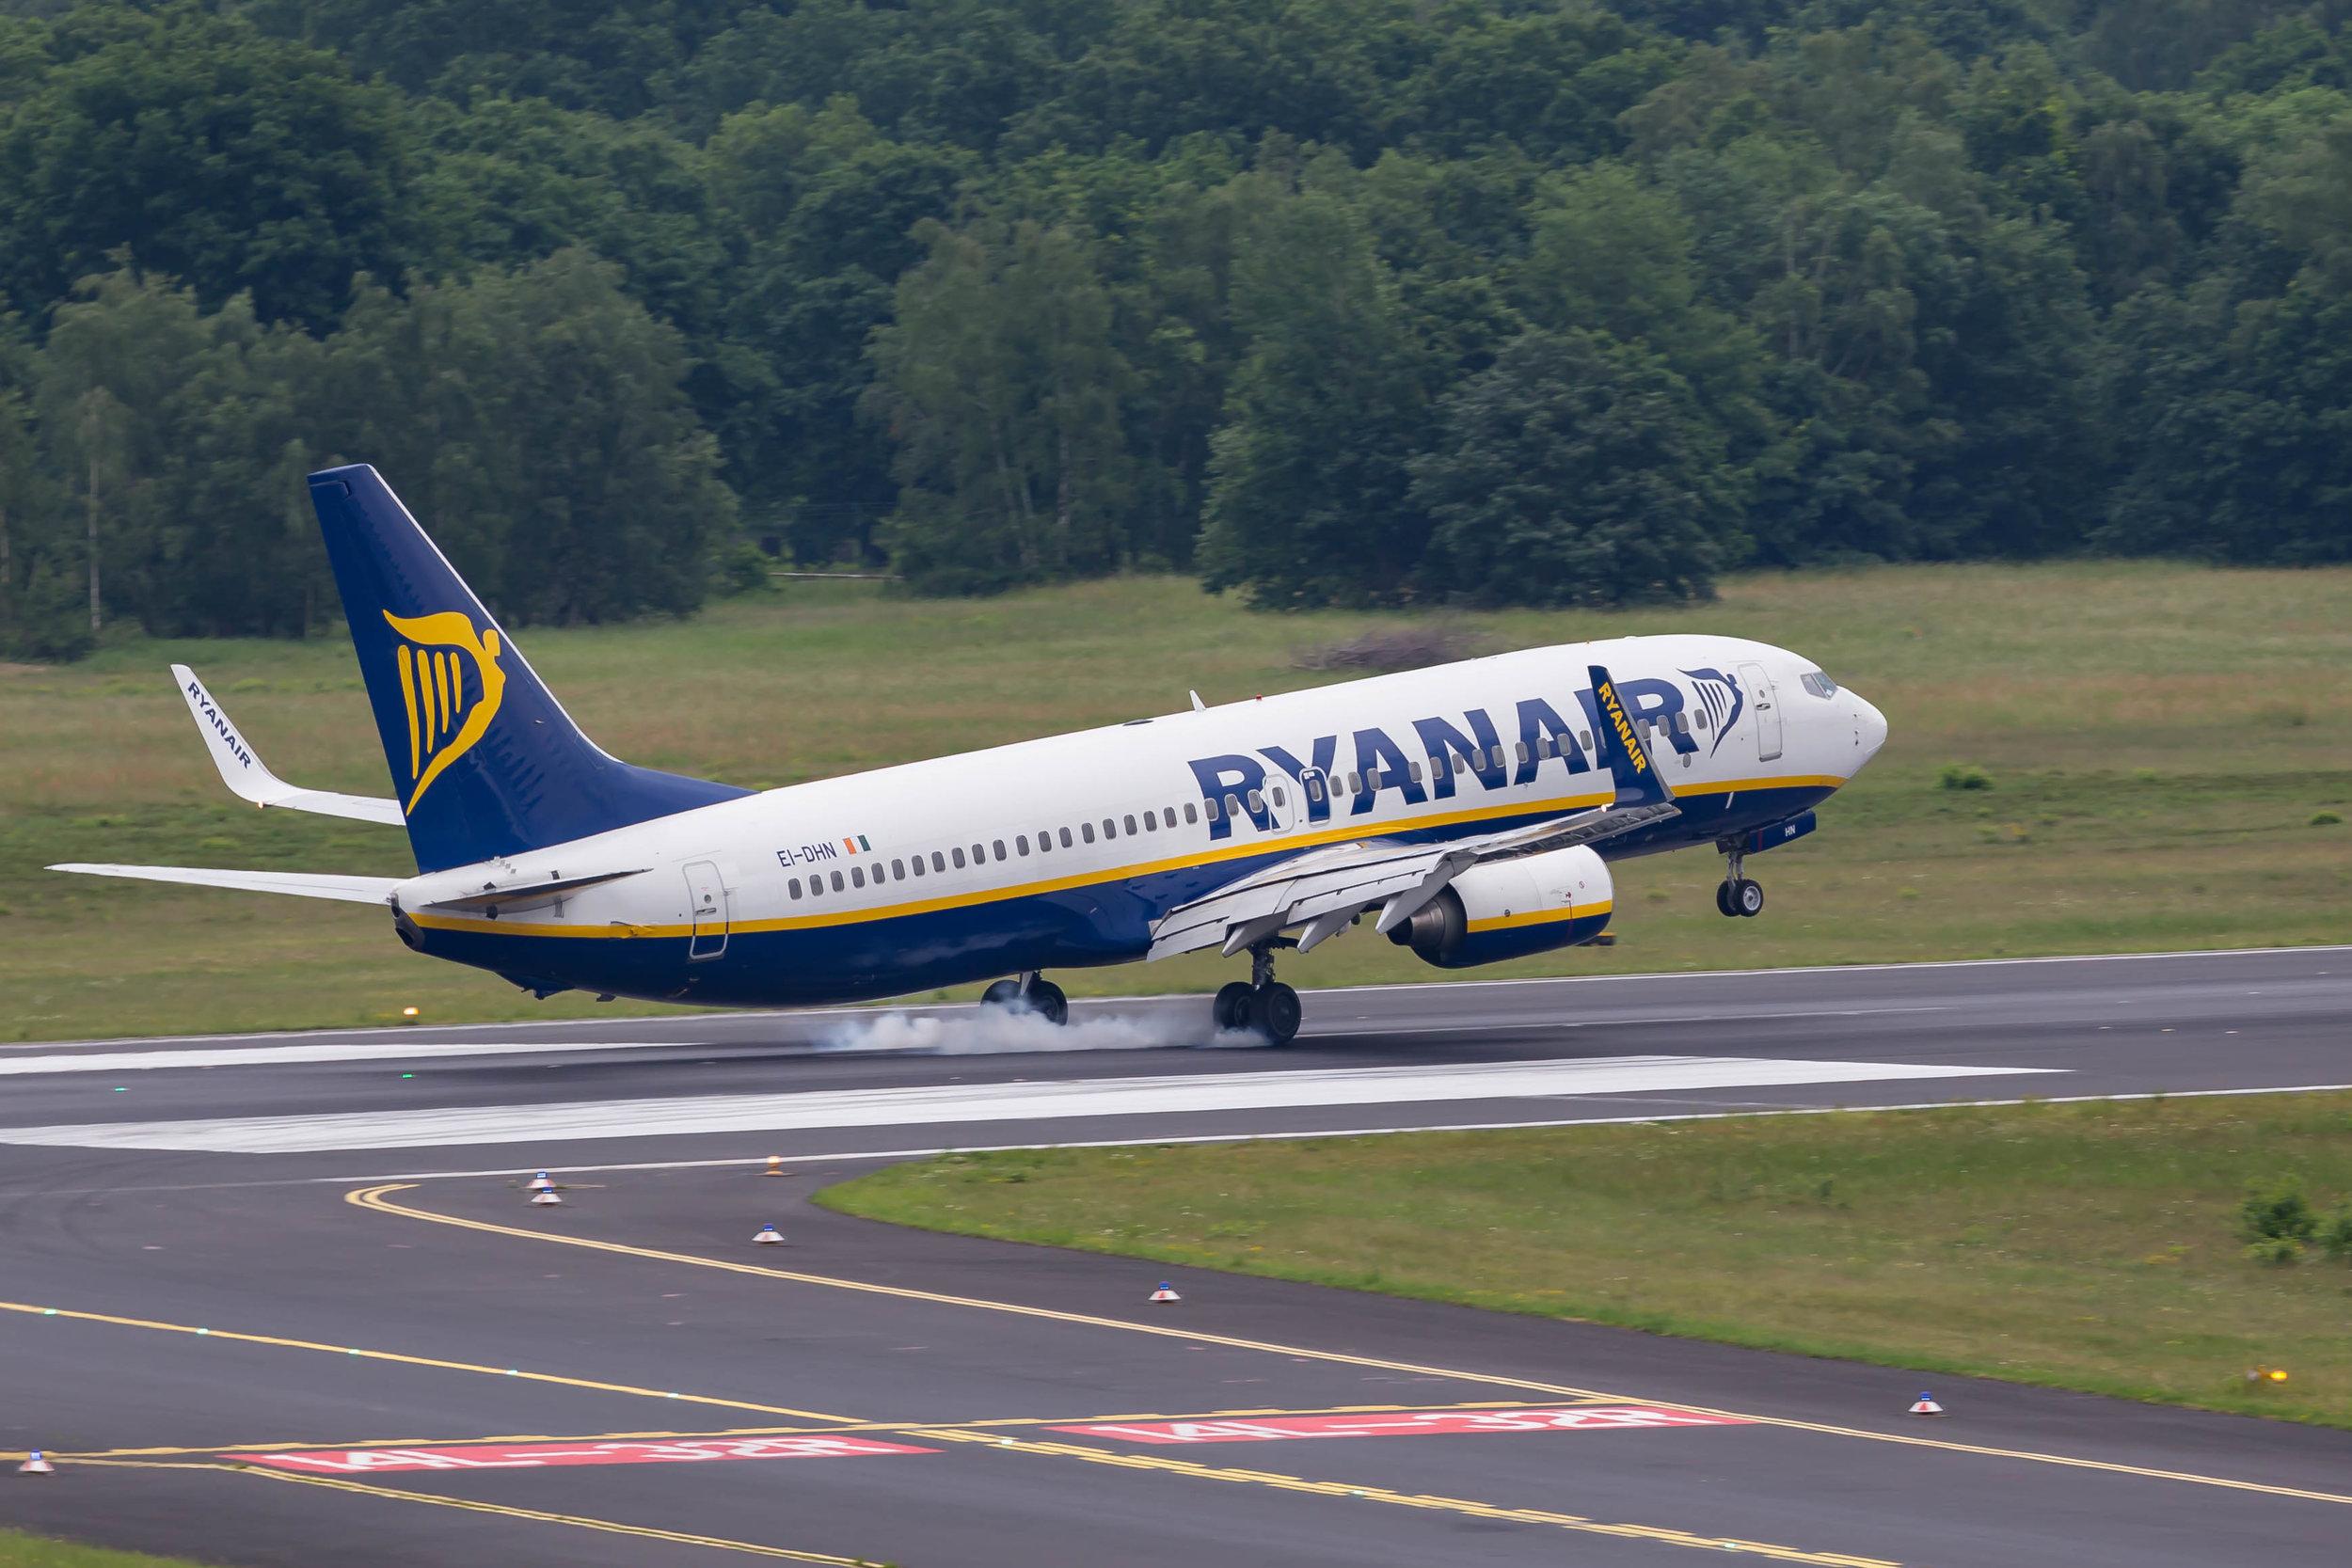 A Ryanair plane. Credit: Marco Verch via Wikimedia Commons.